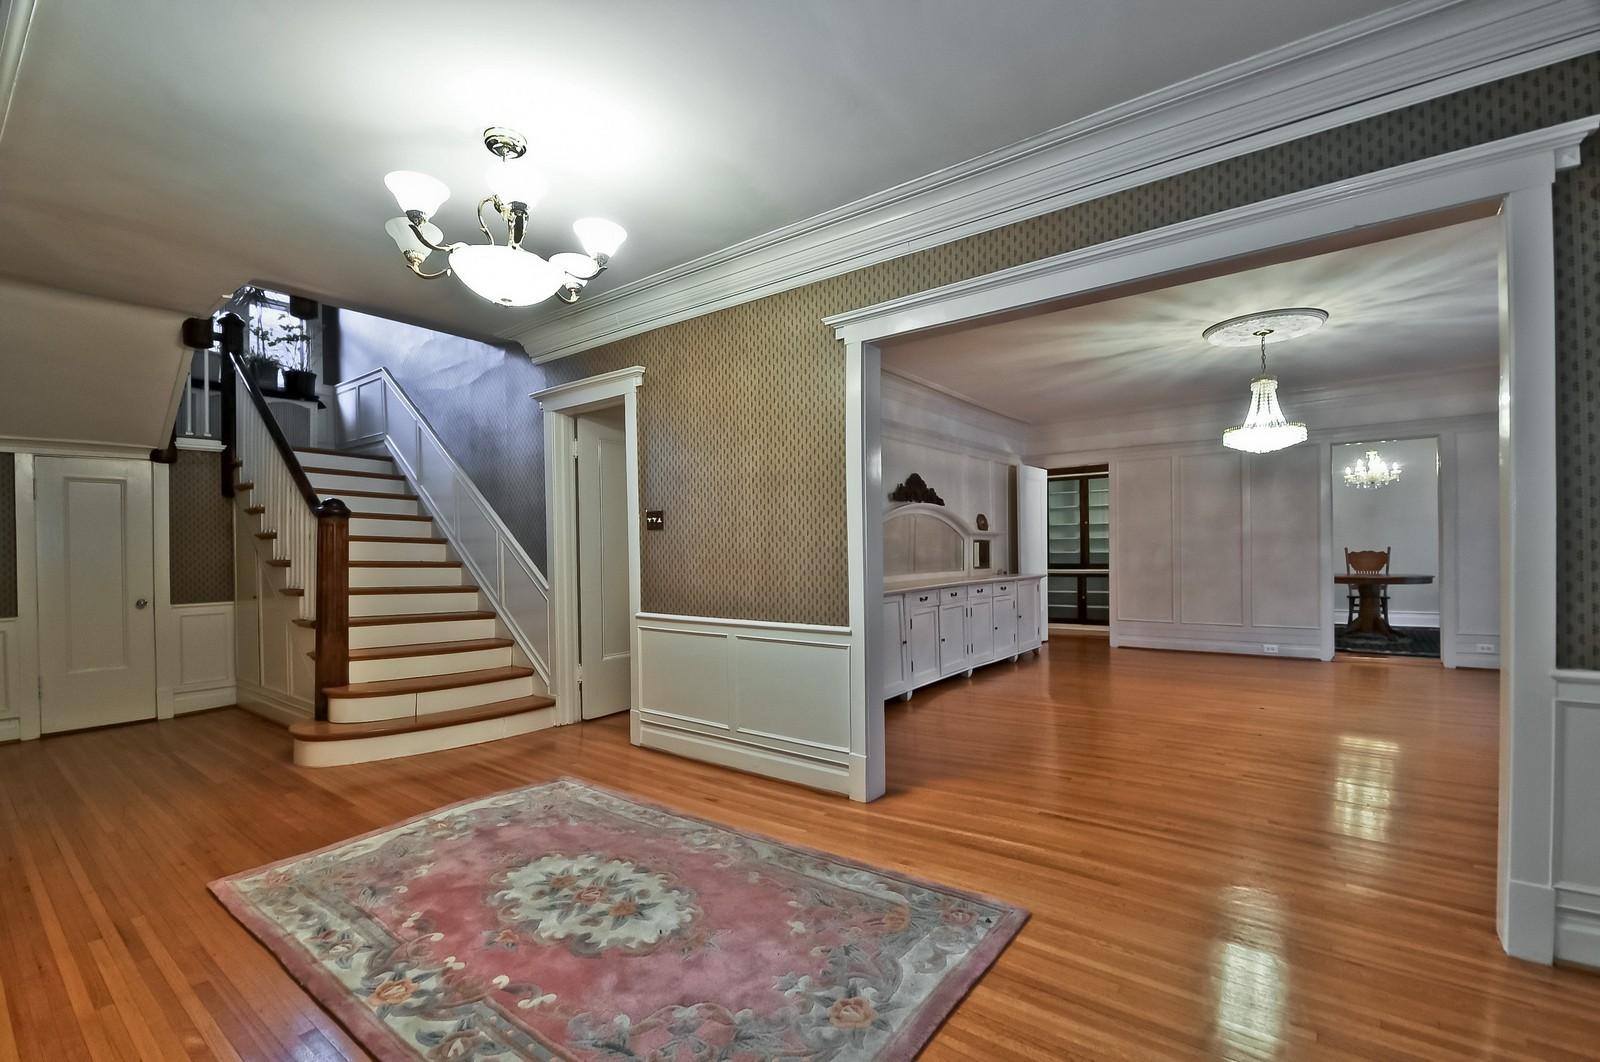 Real Estate Photography - 2226 W Pratt, Chicago, IL, 60645 - Foyer